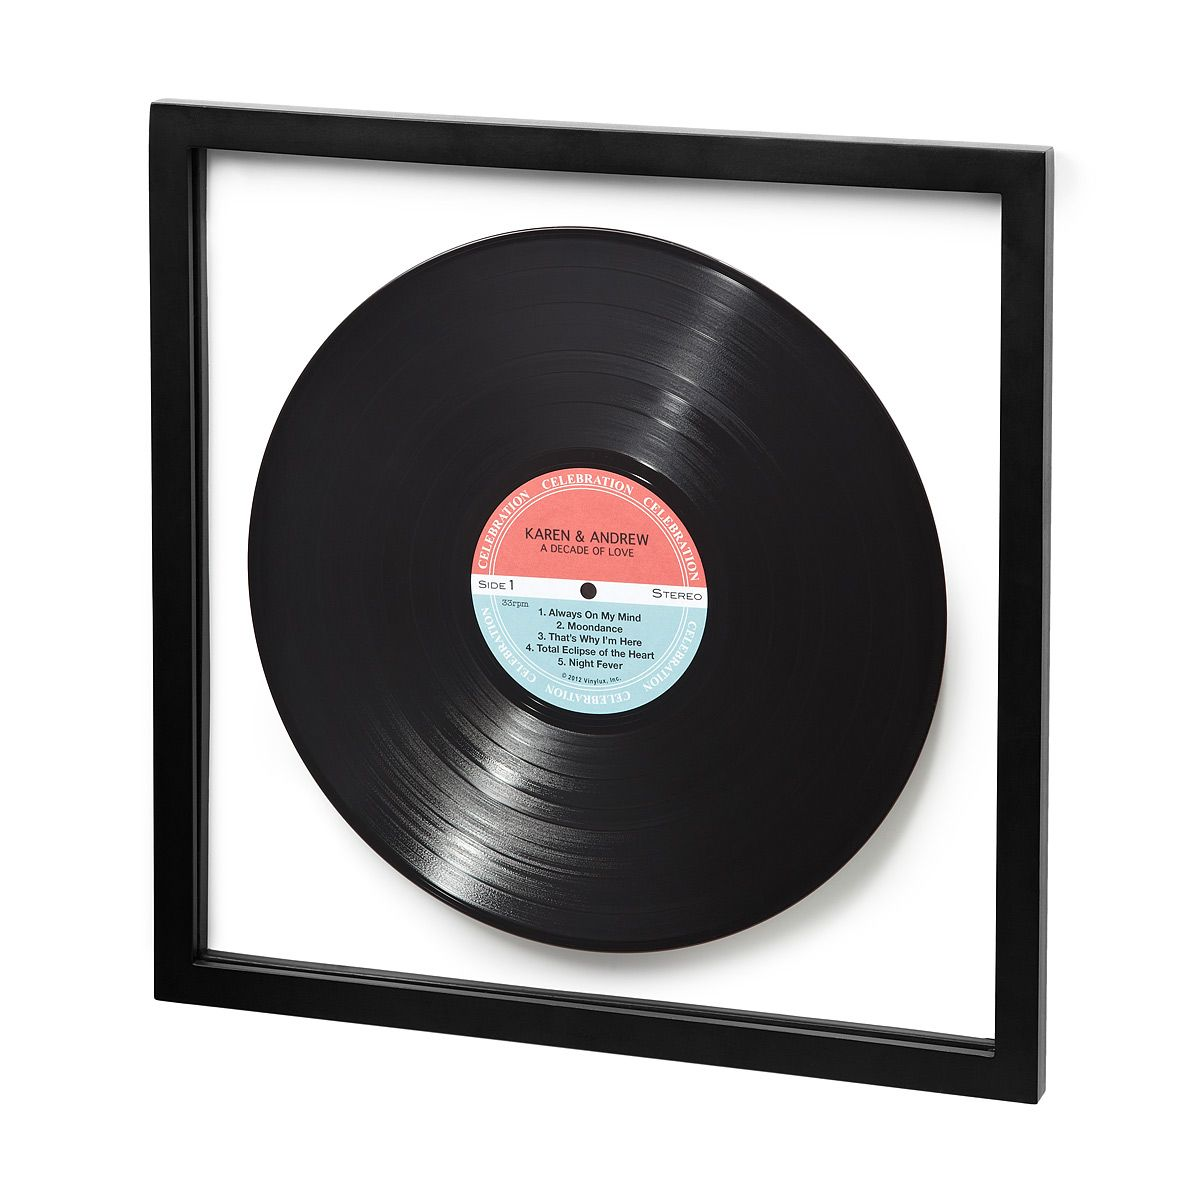 Two Tone Orange Personalized Lp Record Personalized